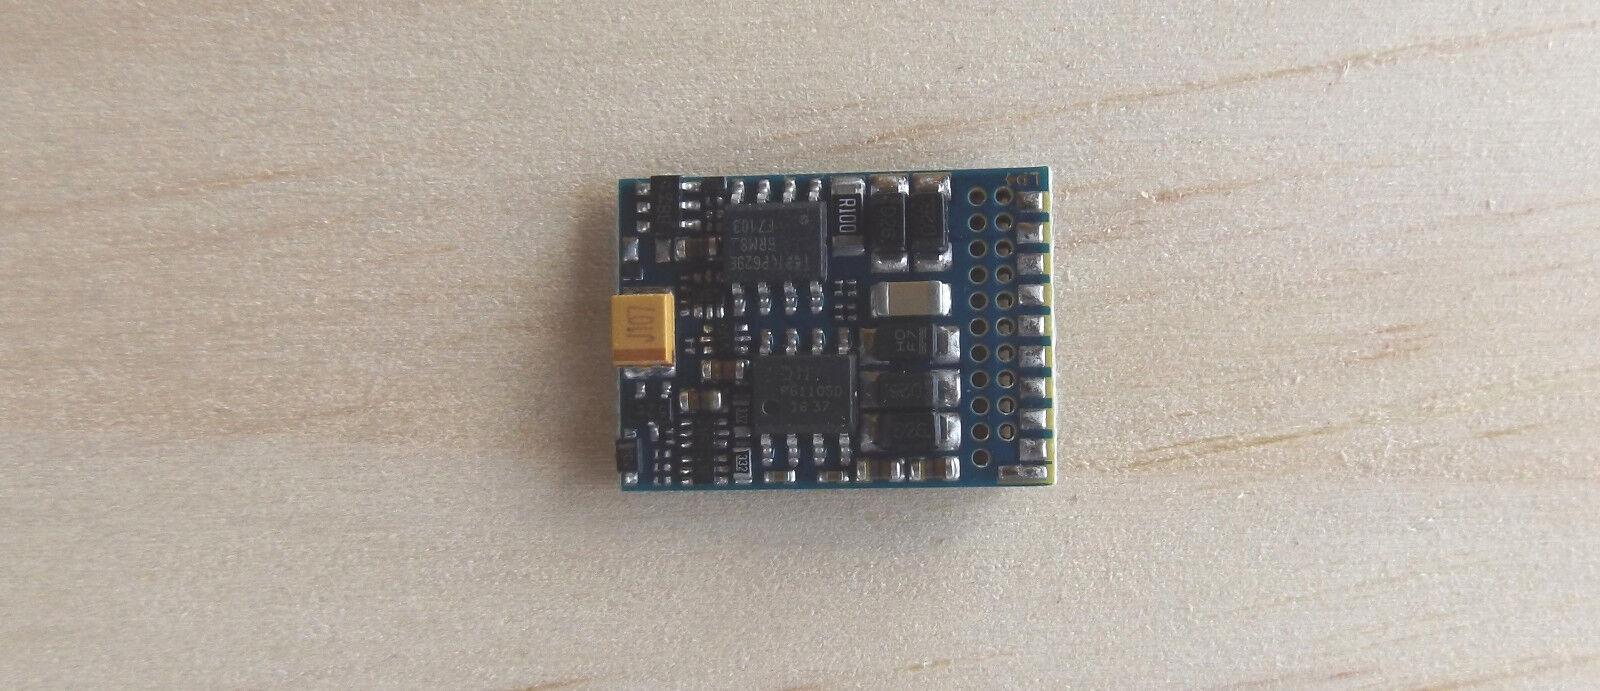 ESU 54614 LokPilot V4.0 Premium Digital Decoder 21MTC